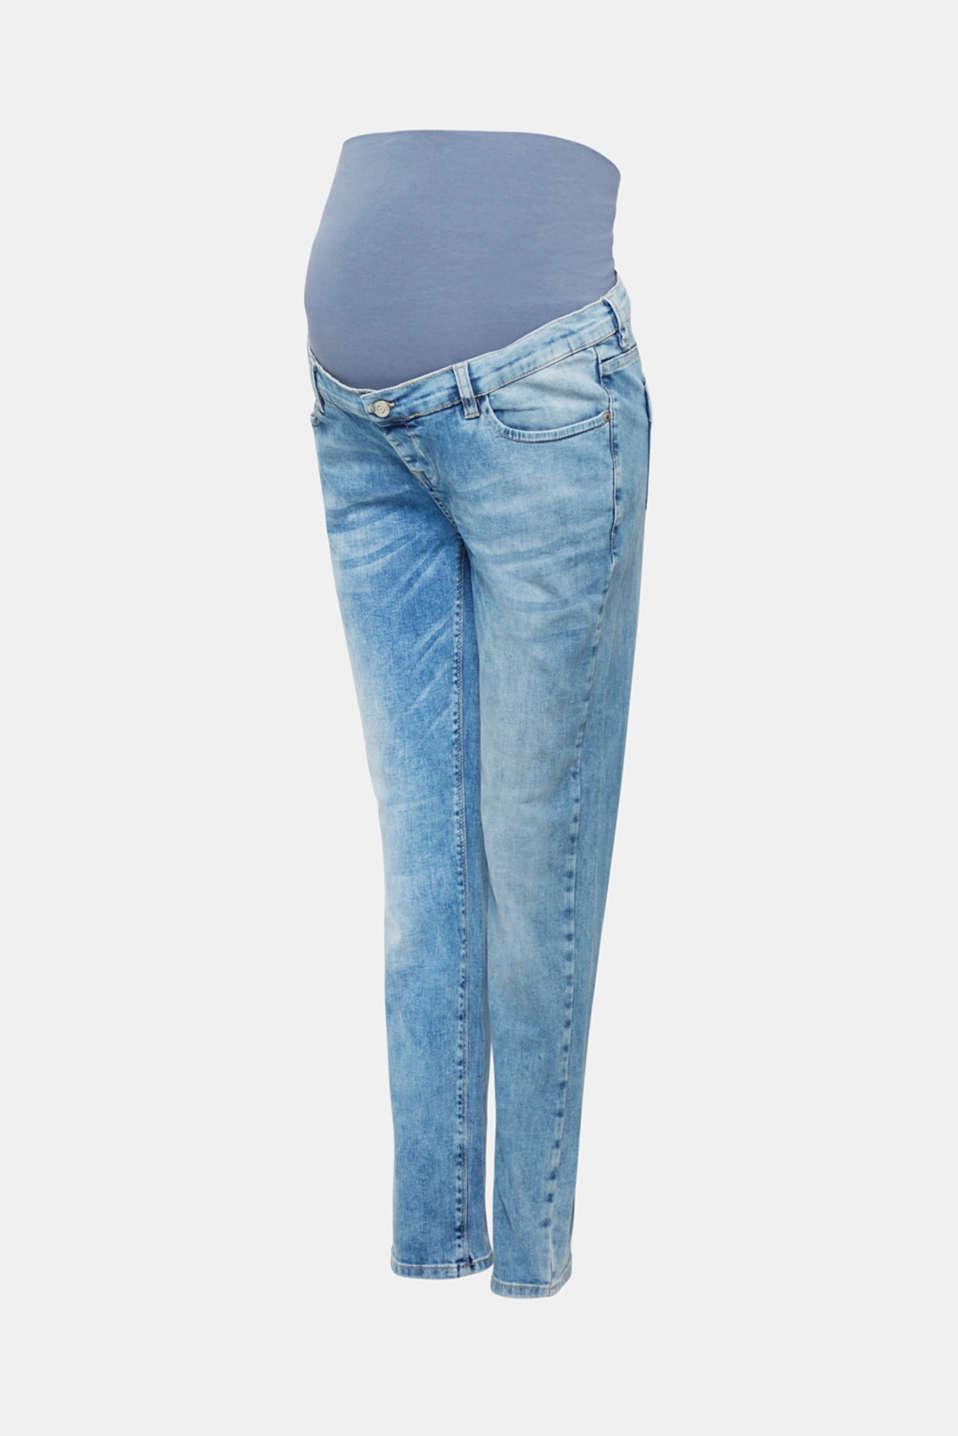 Pants denim, LCLIGHTWASH, detail image number 7